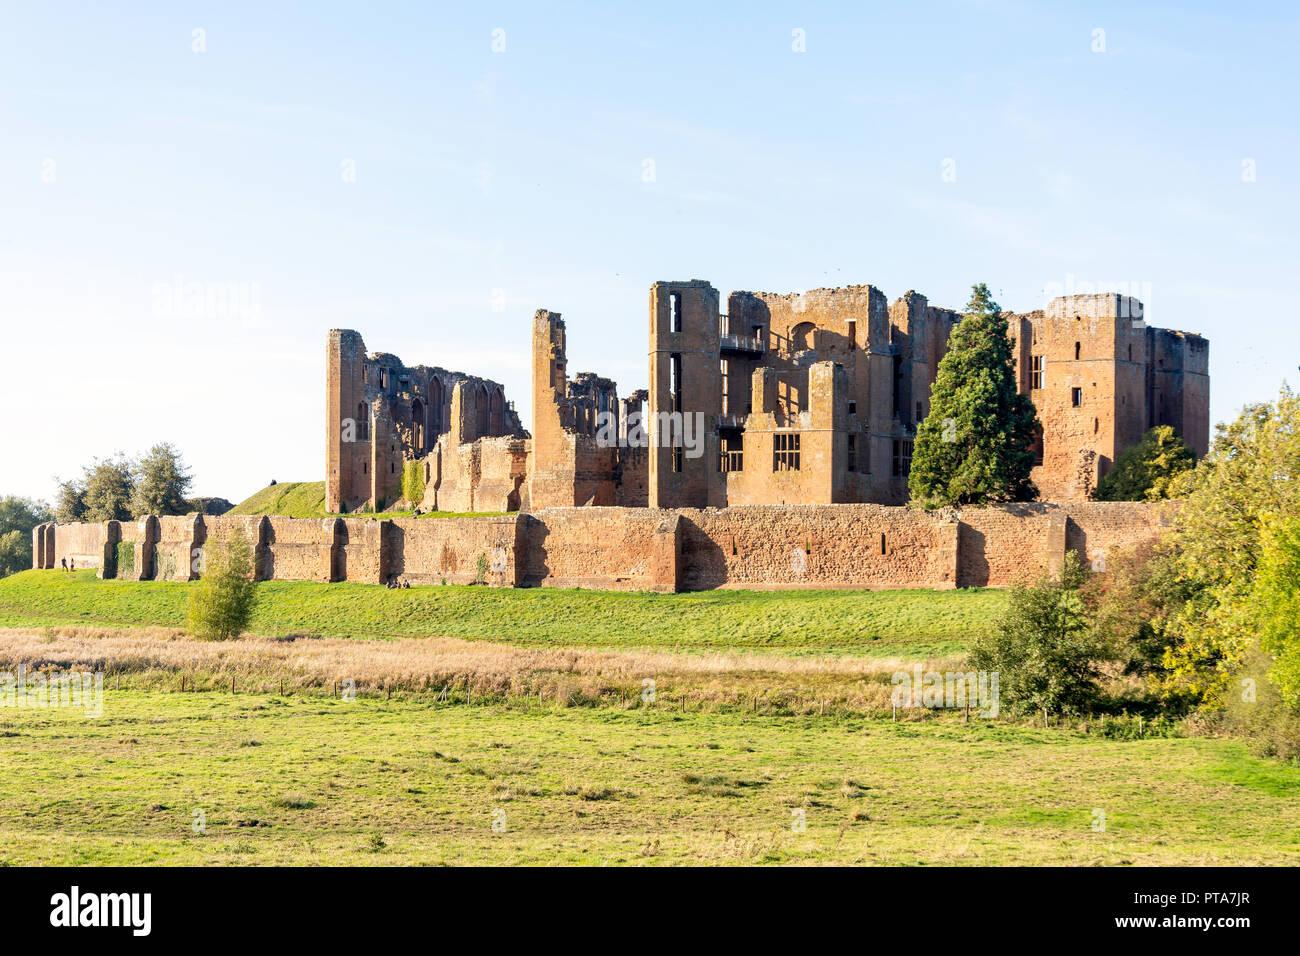 Kenilworth Castle, Kenilworth, Warwickshire, England, United Kingdom - Stock Image